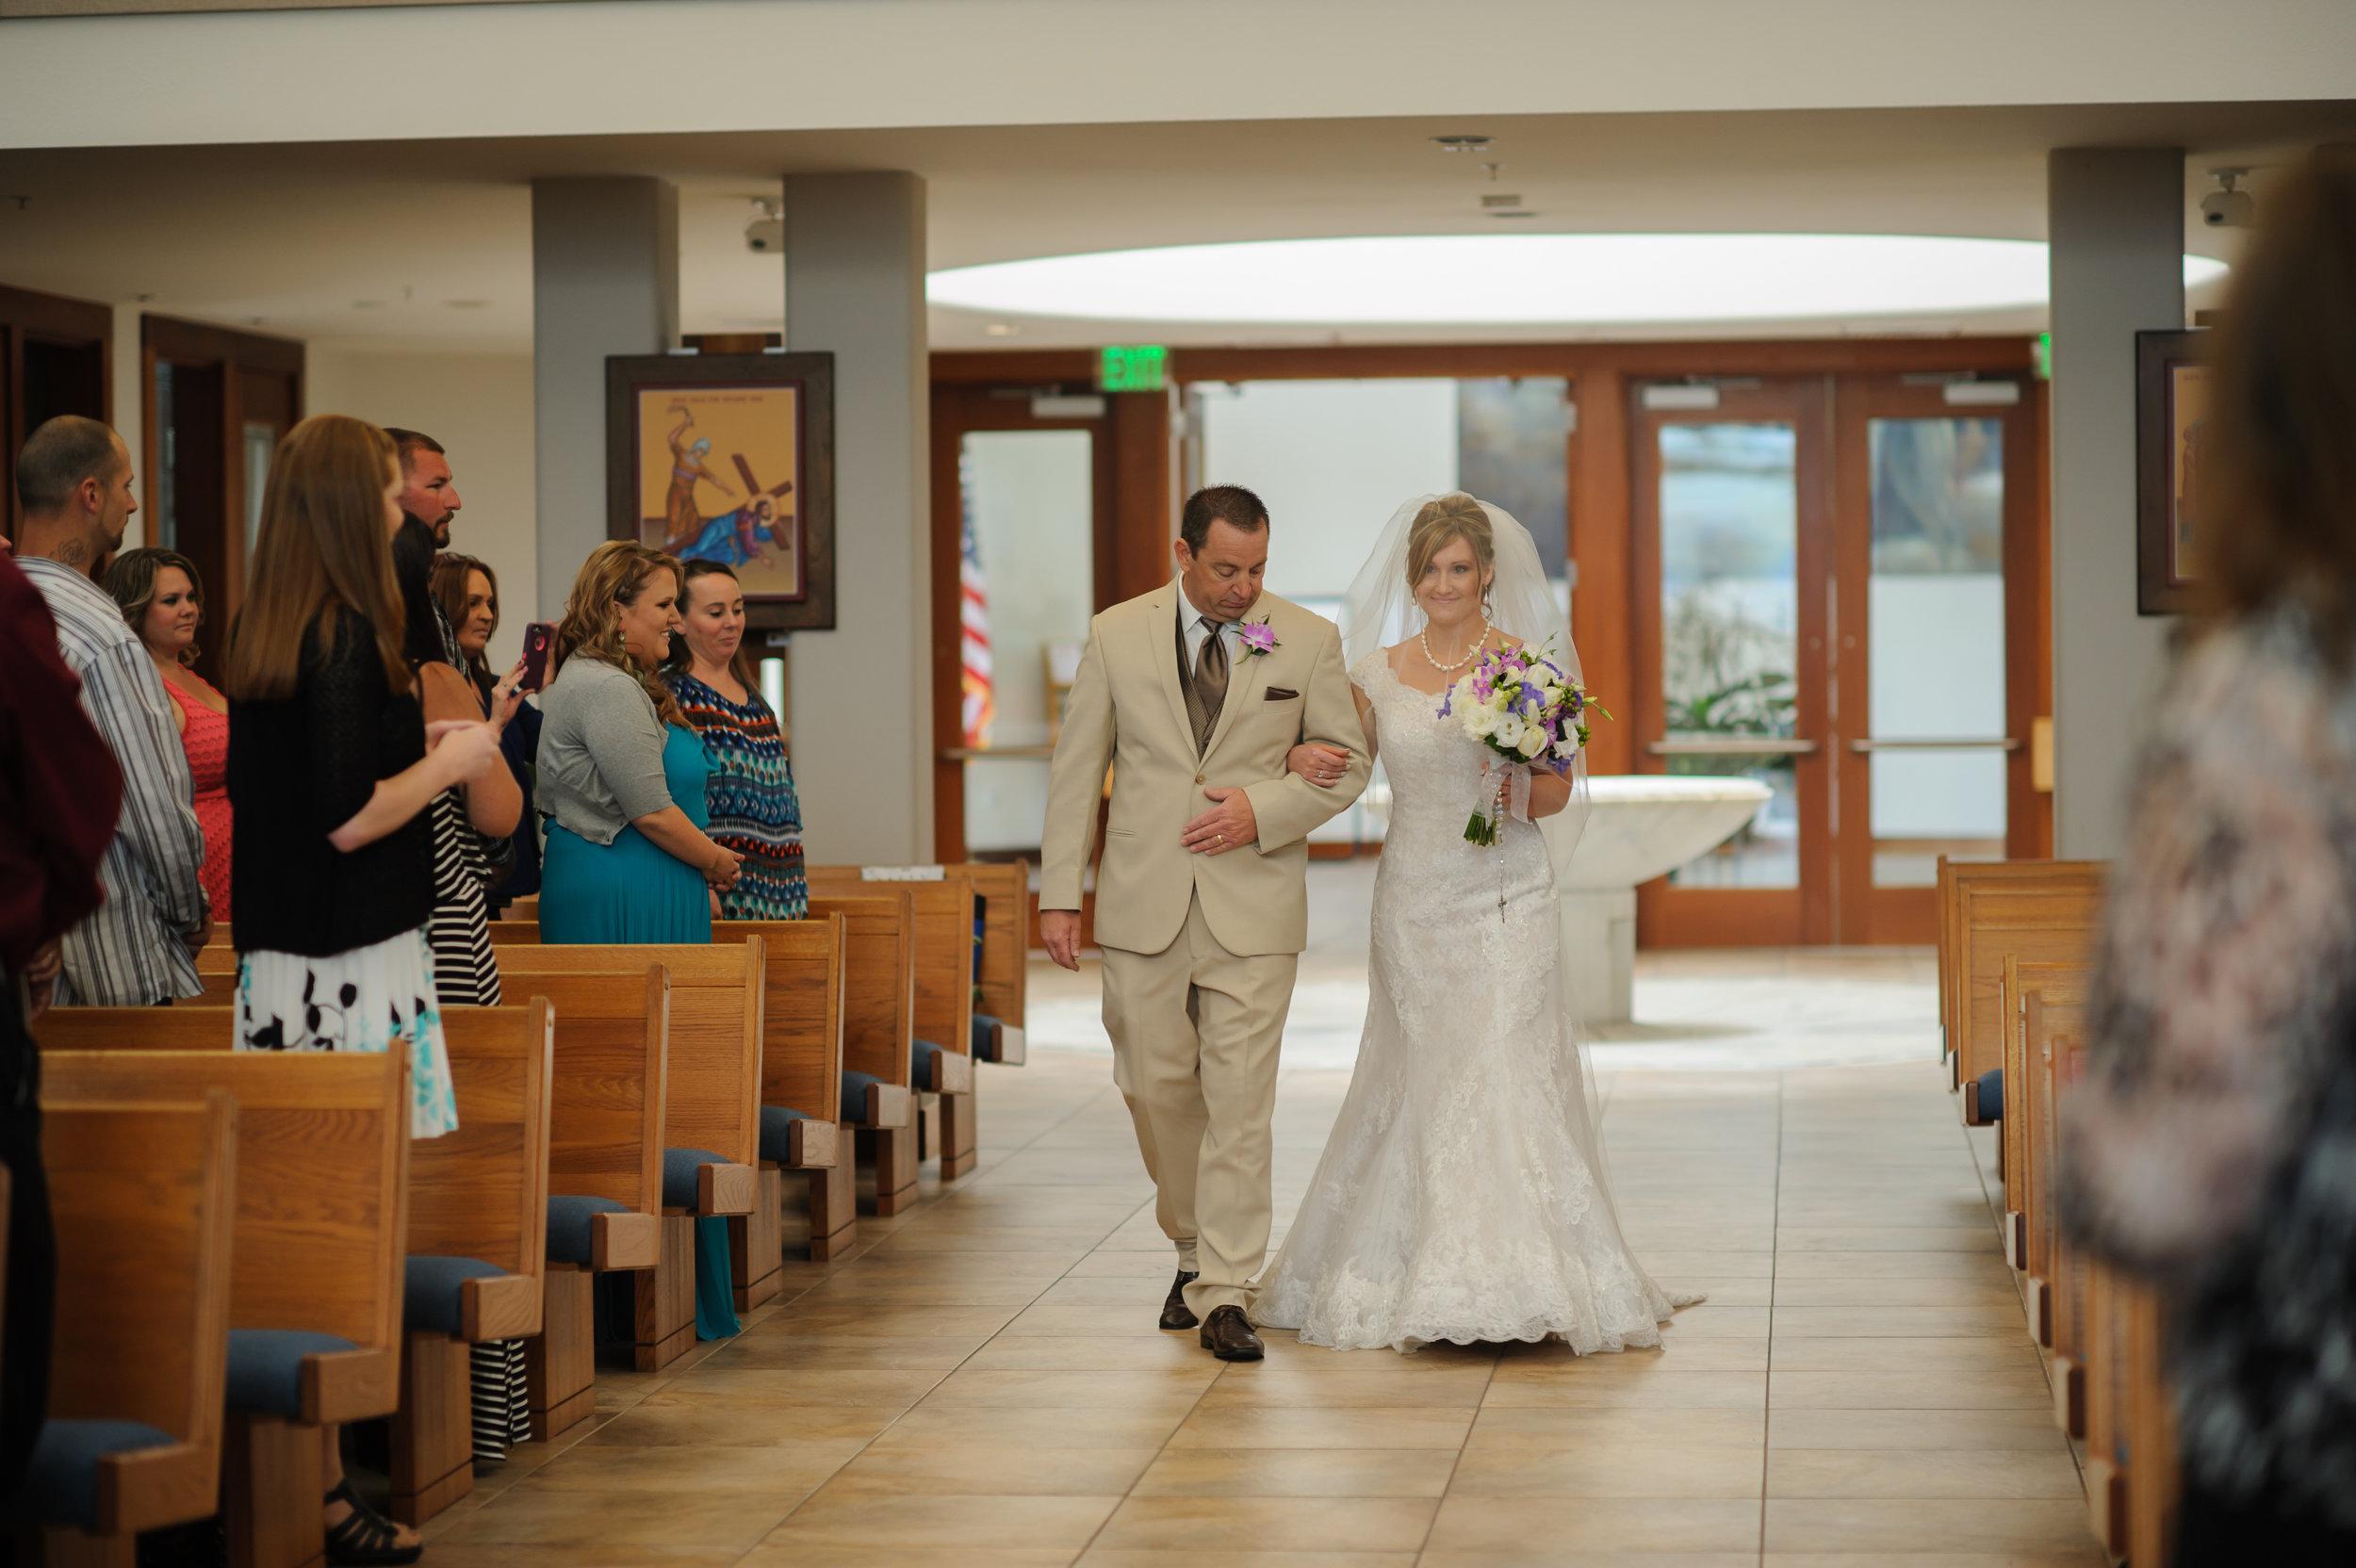 danielle-ross-002-sacramento-wedding-photographer-katherine-nicole-photography.JPG